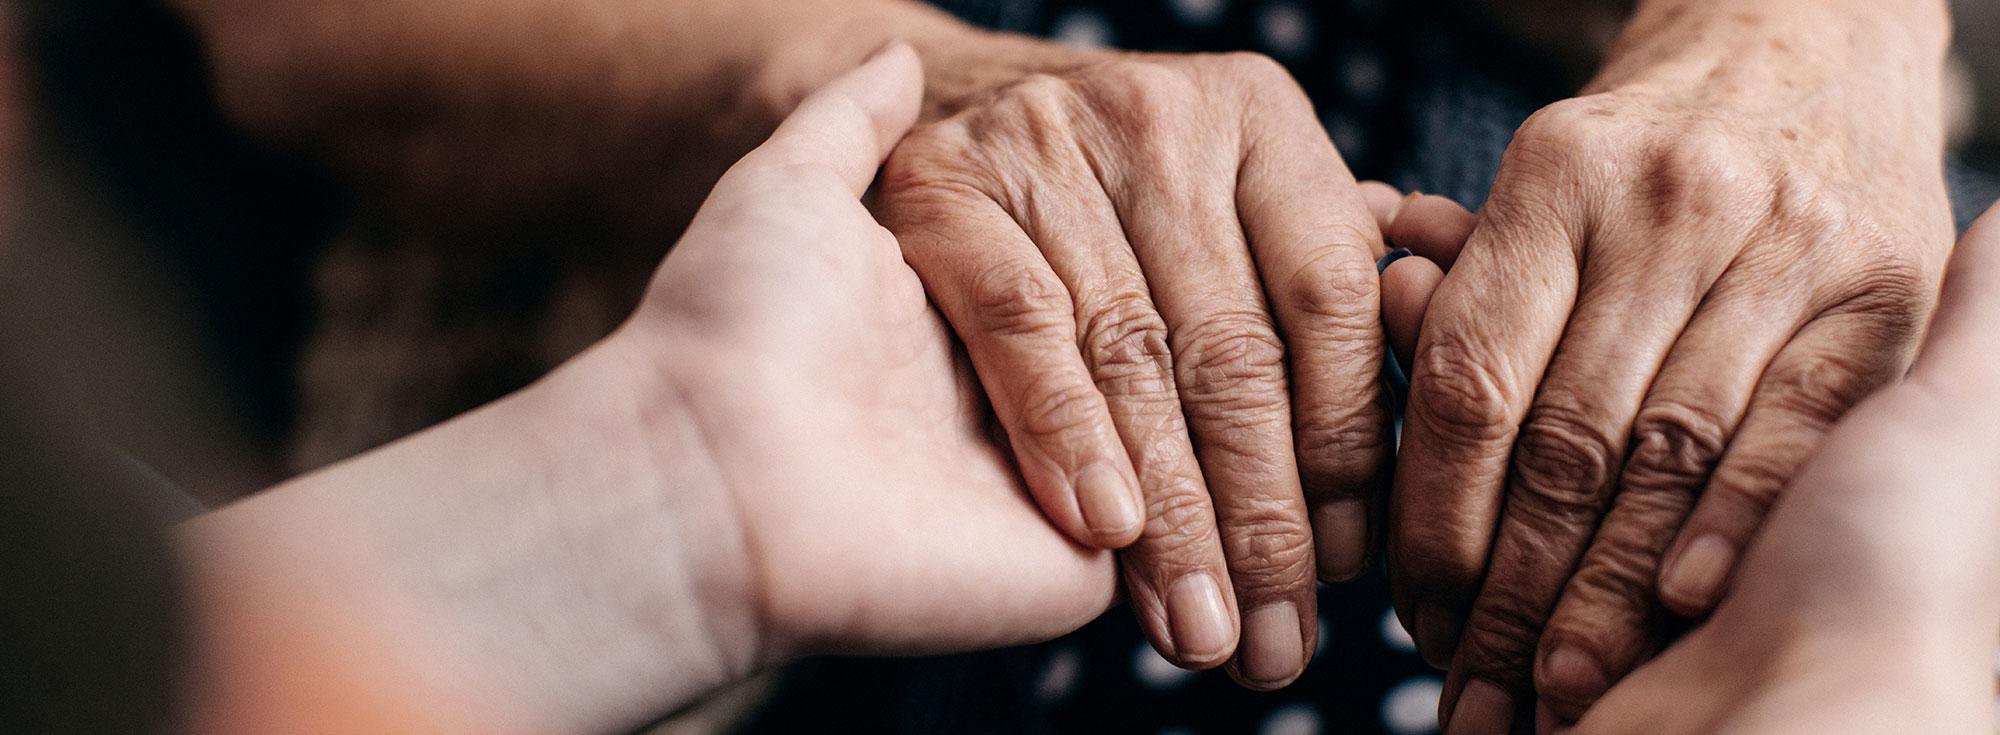 mains tenues